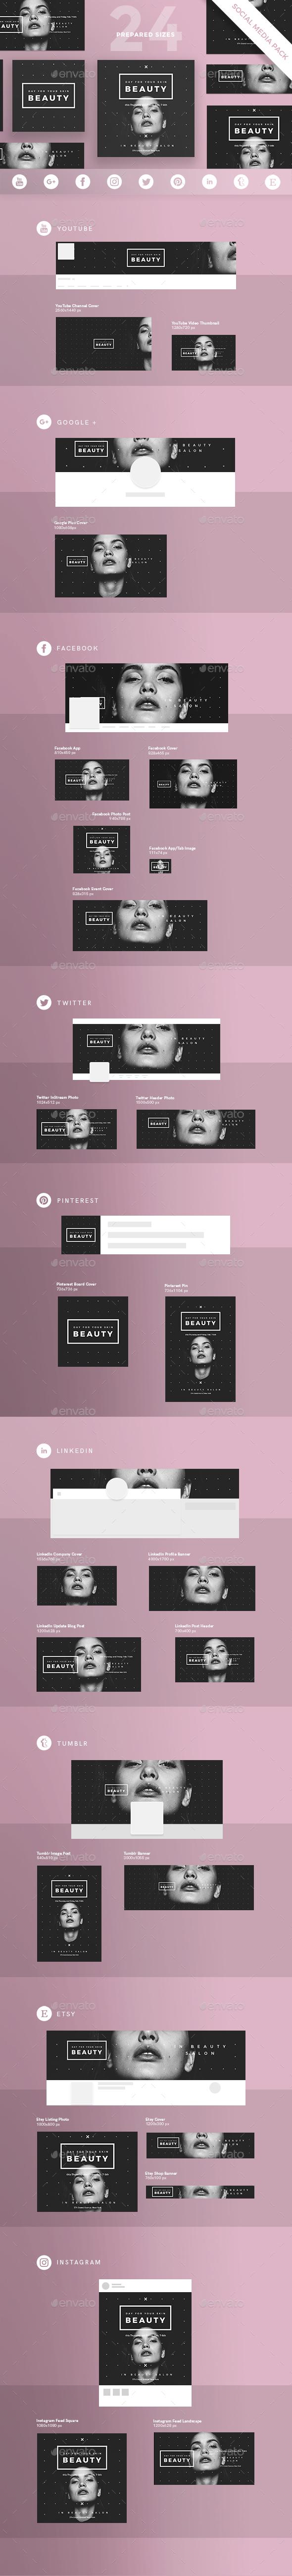 Skin Beauty Social Media Pack - Miscellaneous Social Media